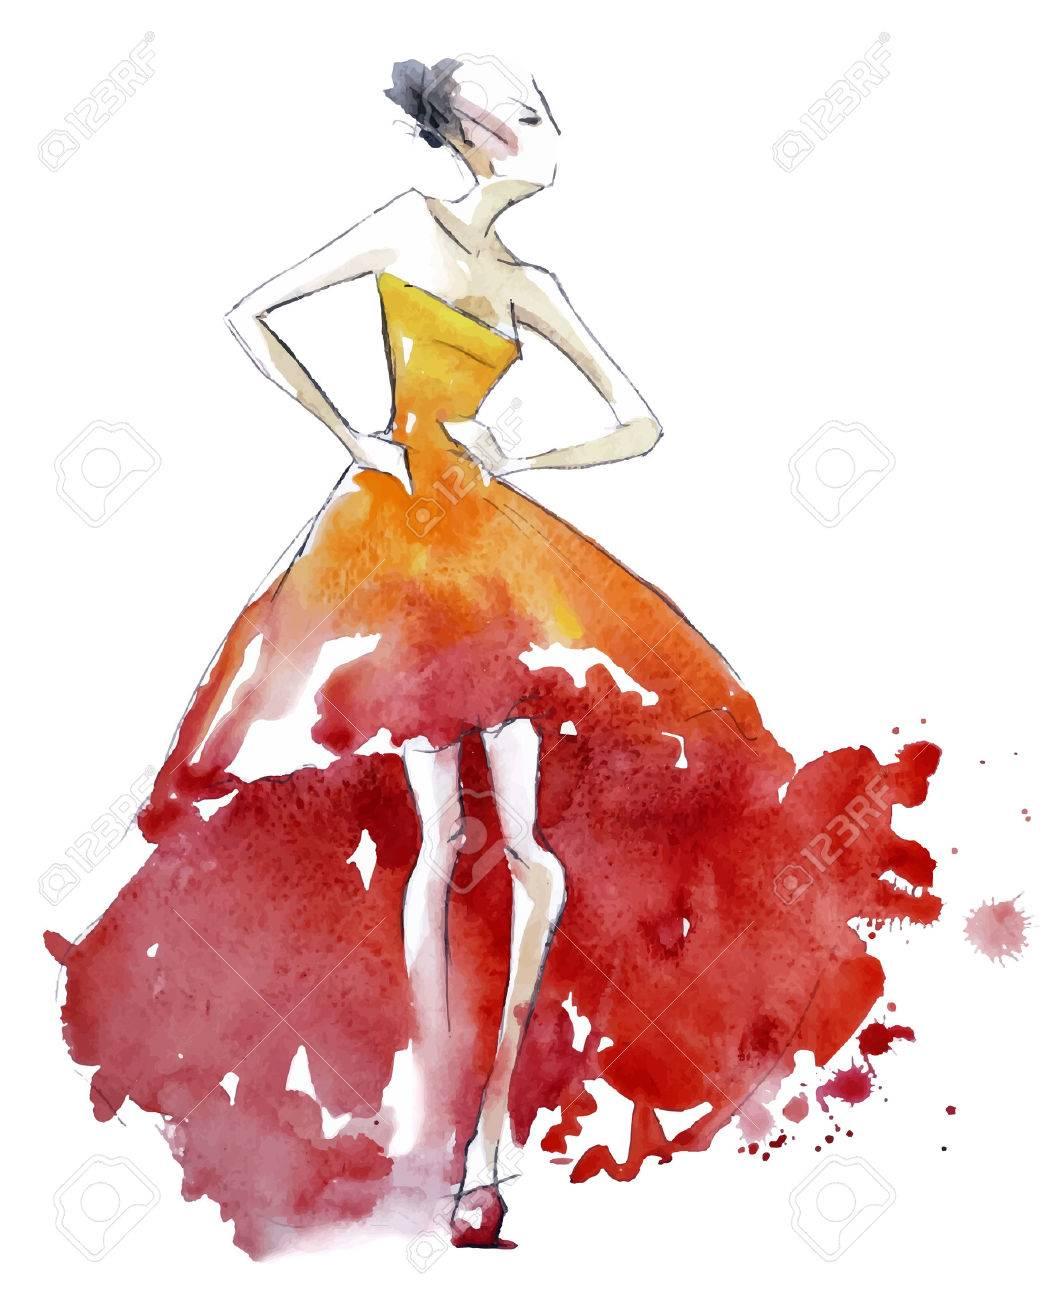 Red dress fashion illustration, vector EPS 10 - 29904153